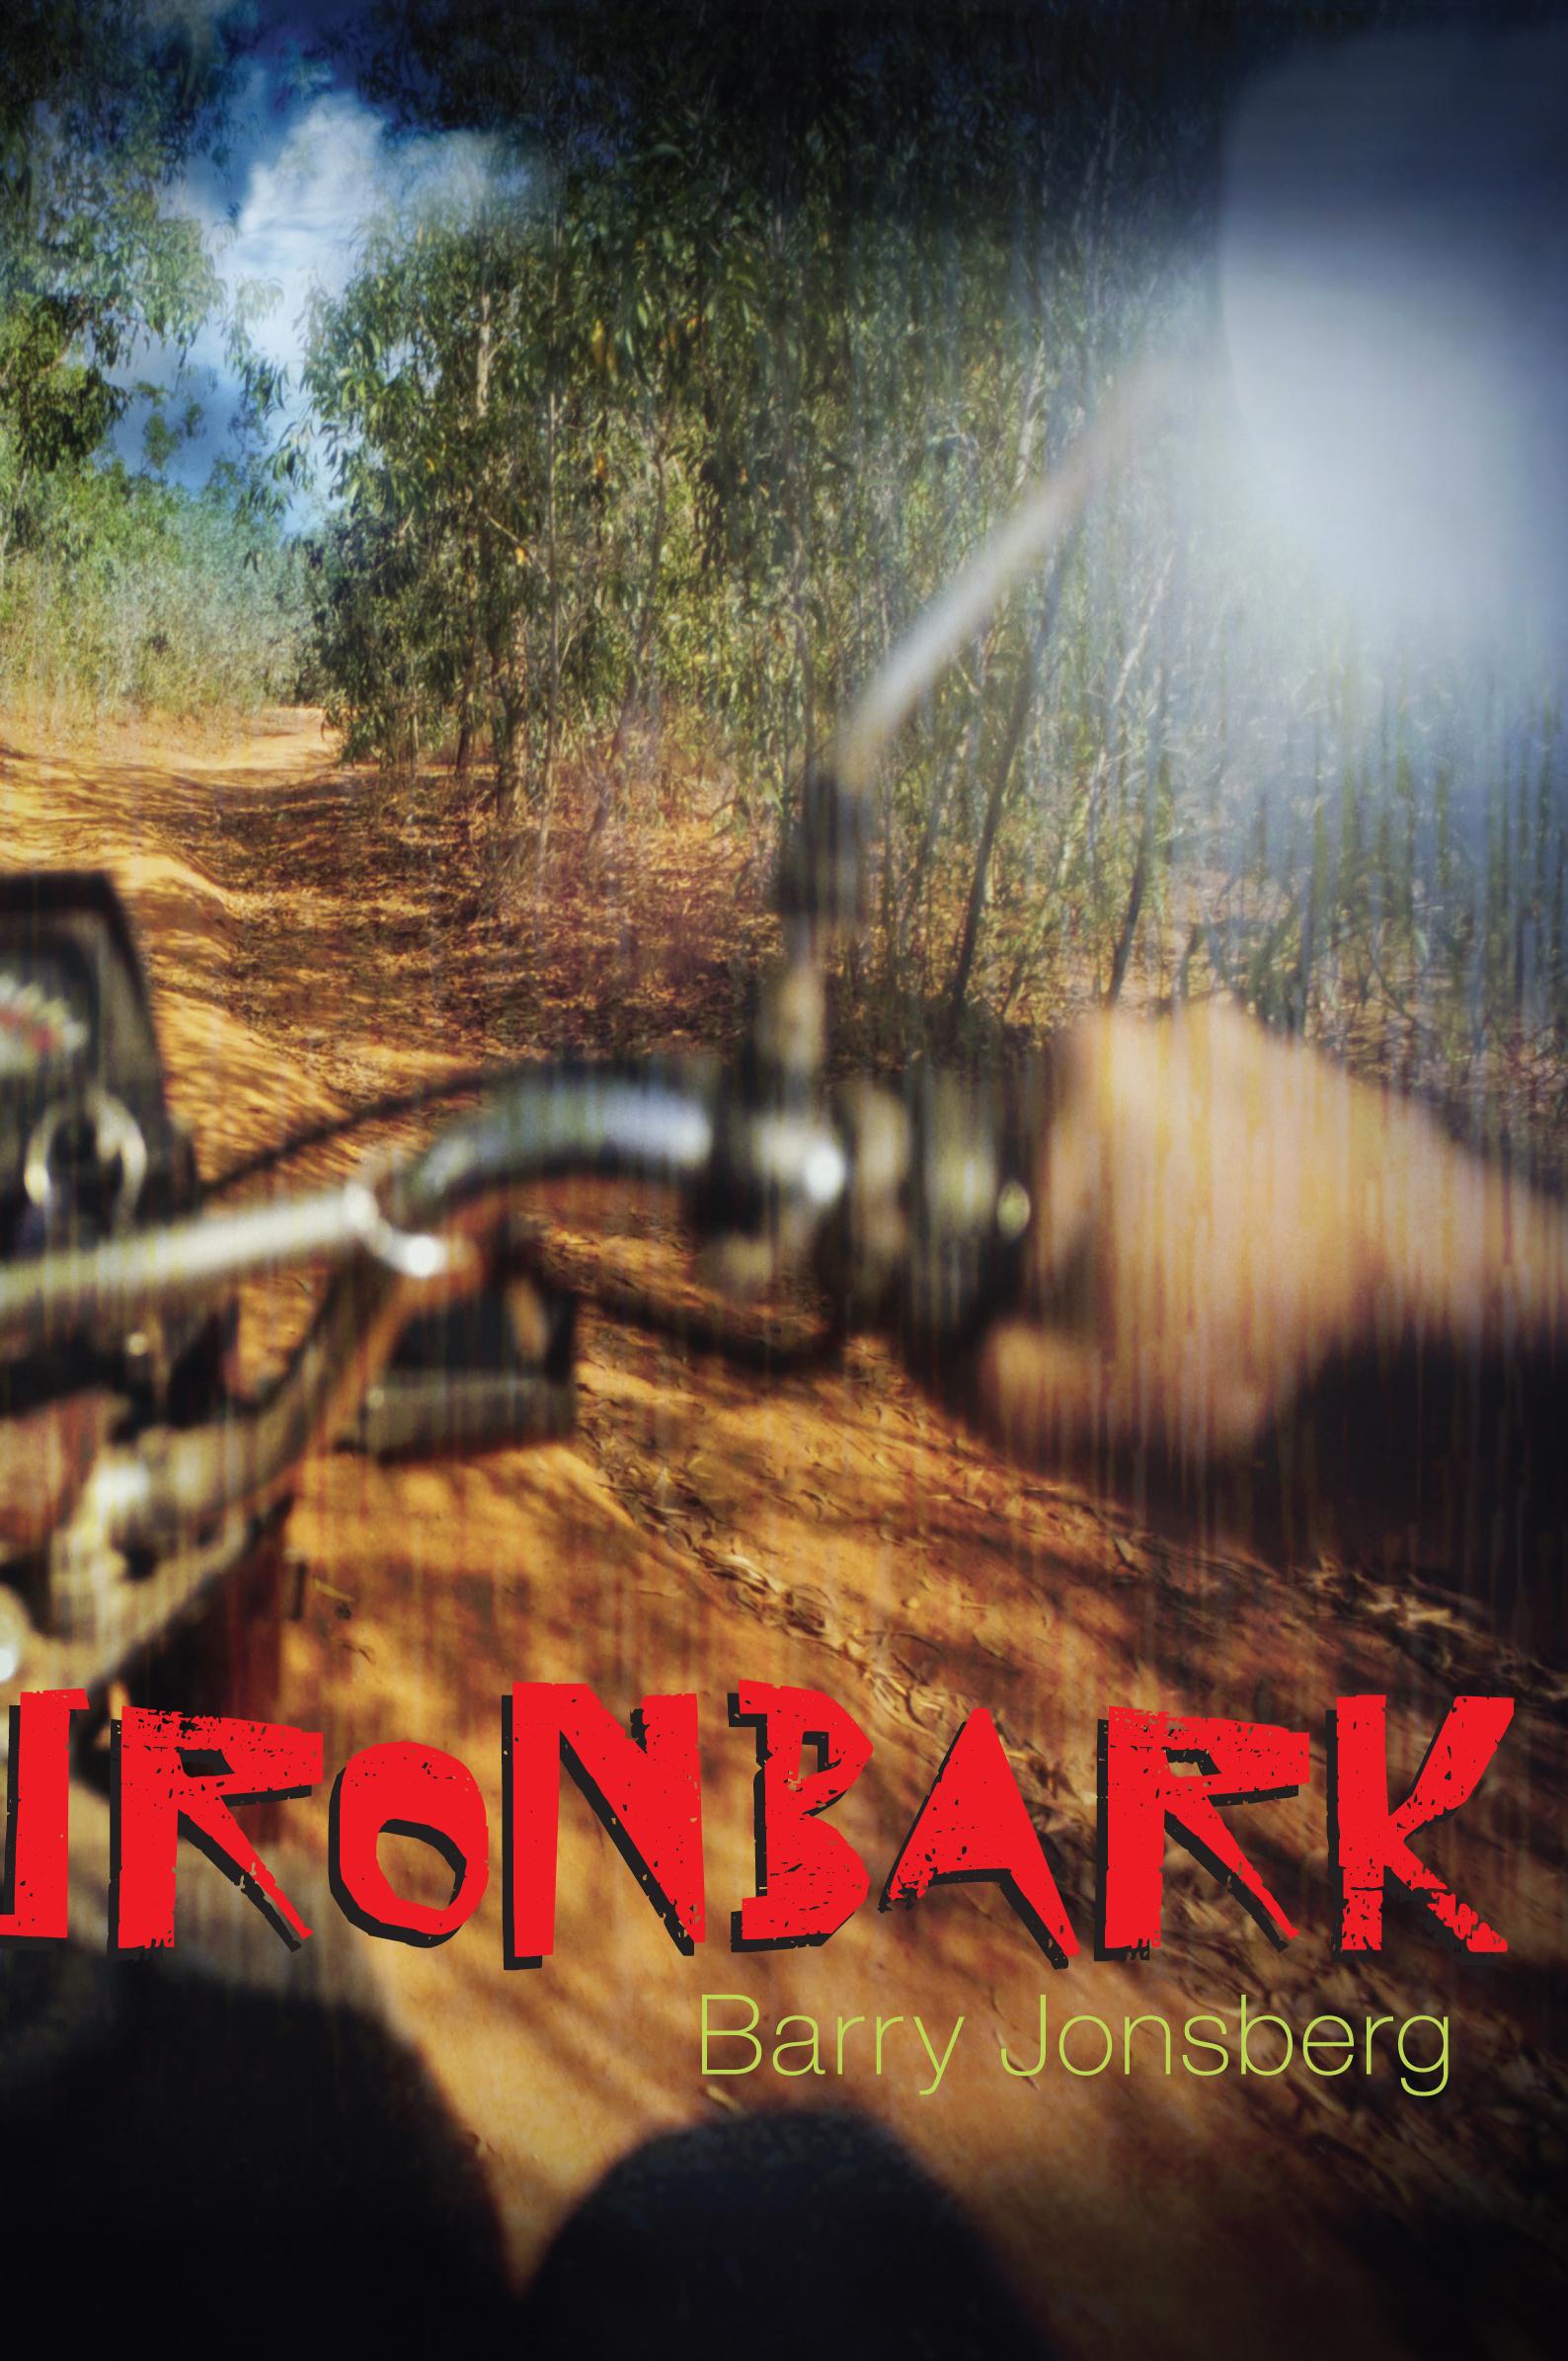 Ironbark - Barry Jonsberg - 9781741149555 - Allen & Unwin - Australia